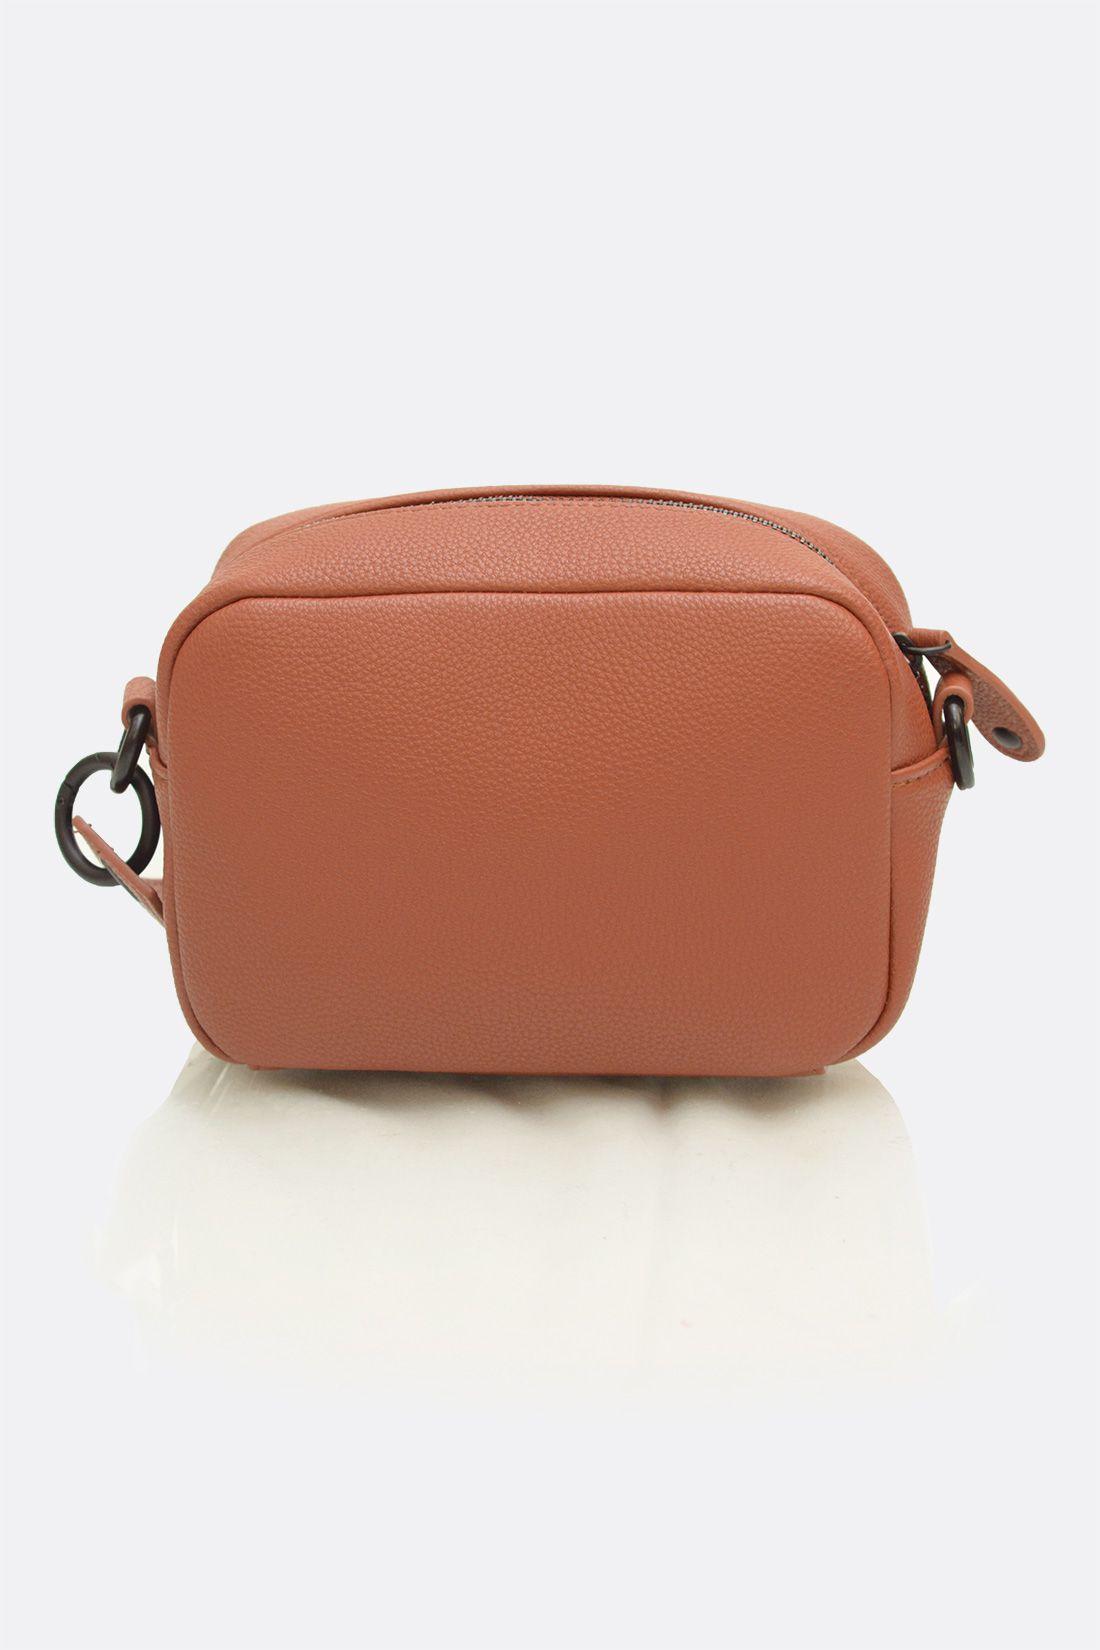 Bolsa Colcci Bag Charm